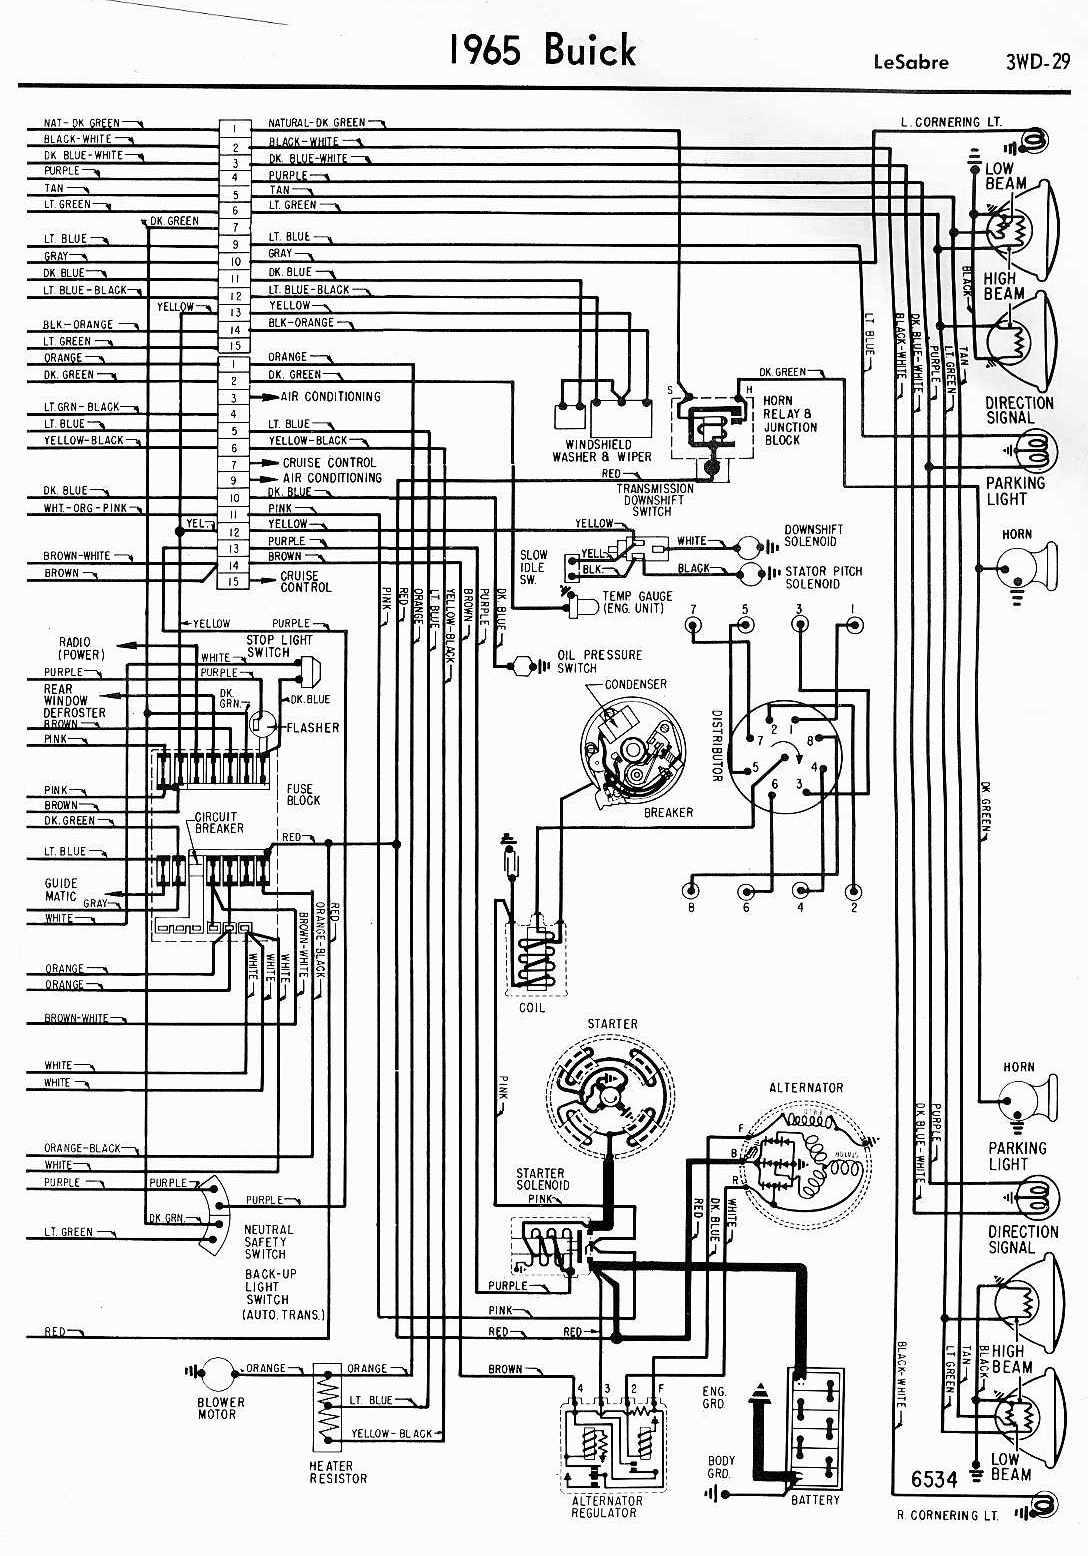 1978 buick wiring diagram wiring diagrams scematic1974 buick apollo wiring diagram wiring diagram todays 1995 buick [ 1088 x 1556 Pixel ]